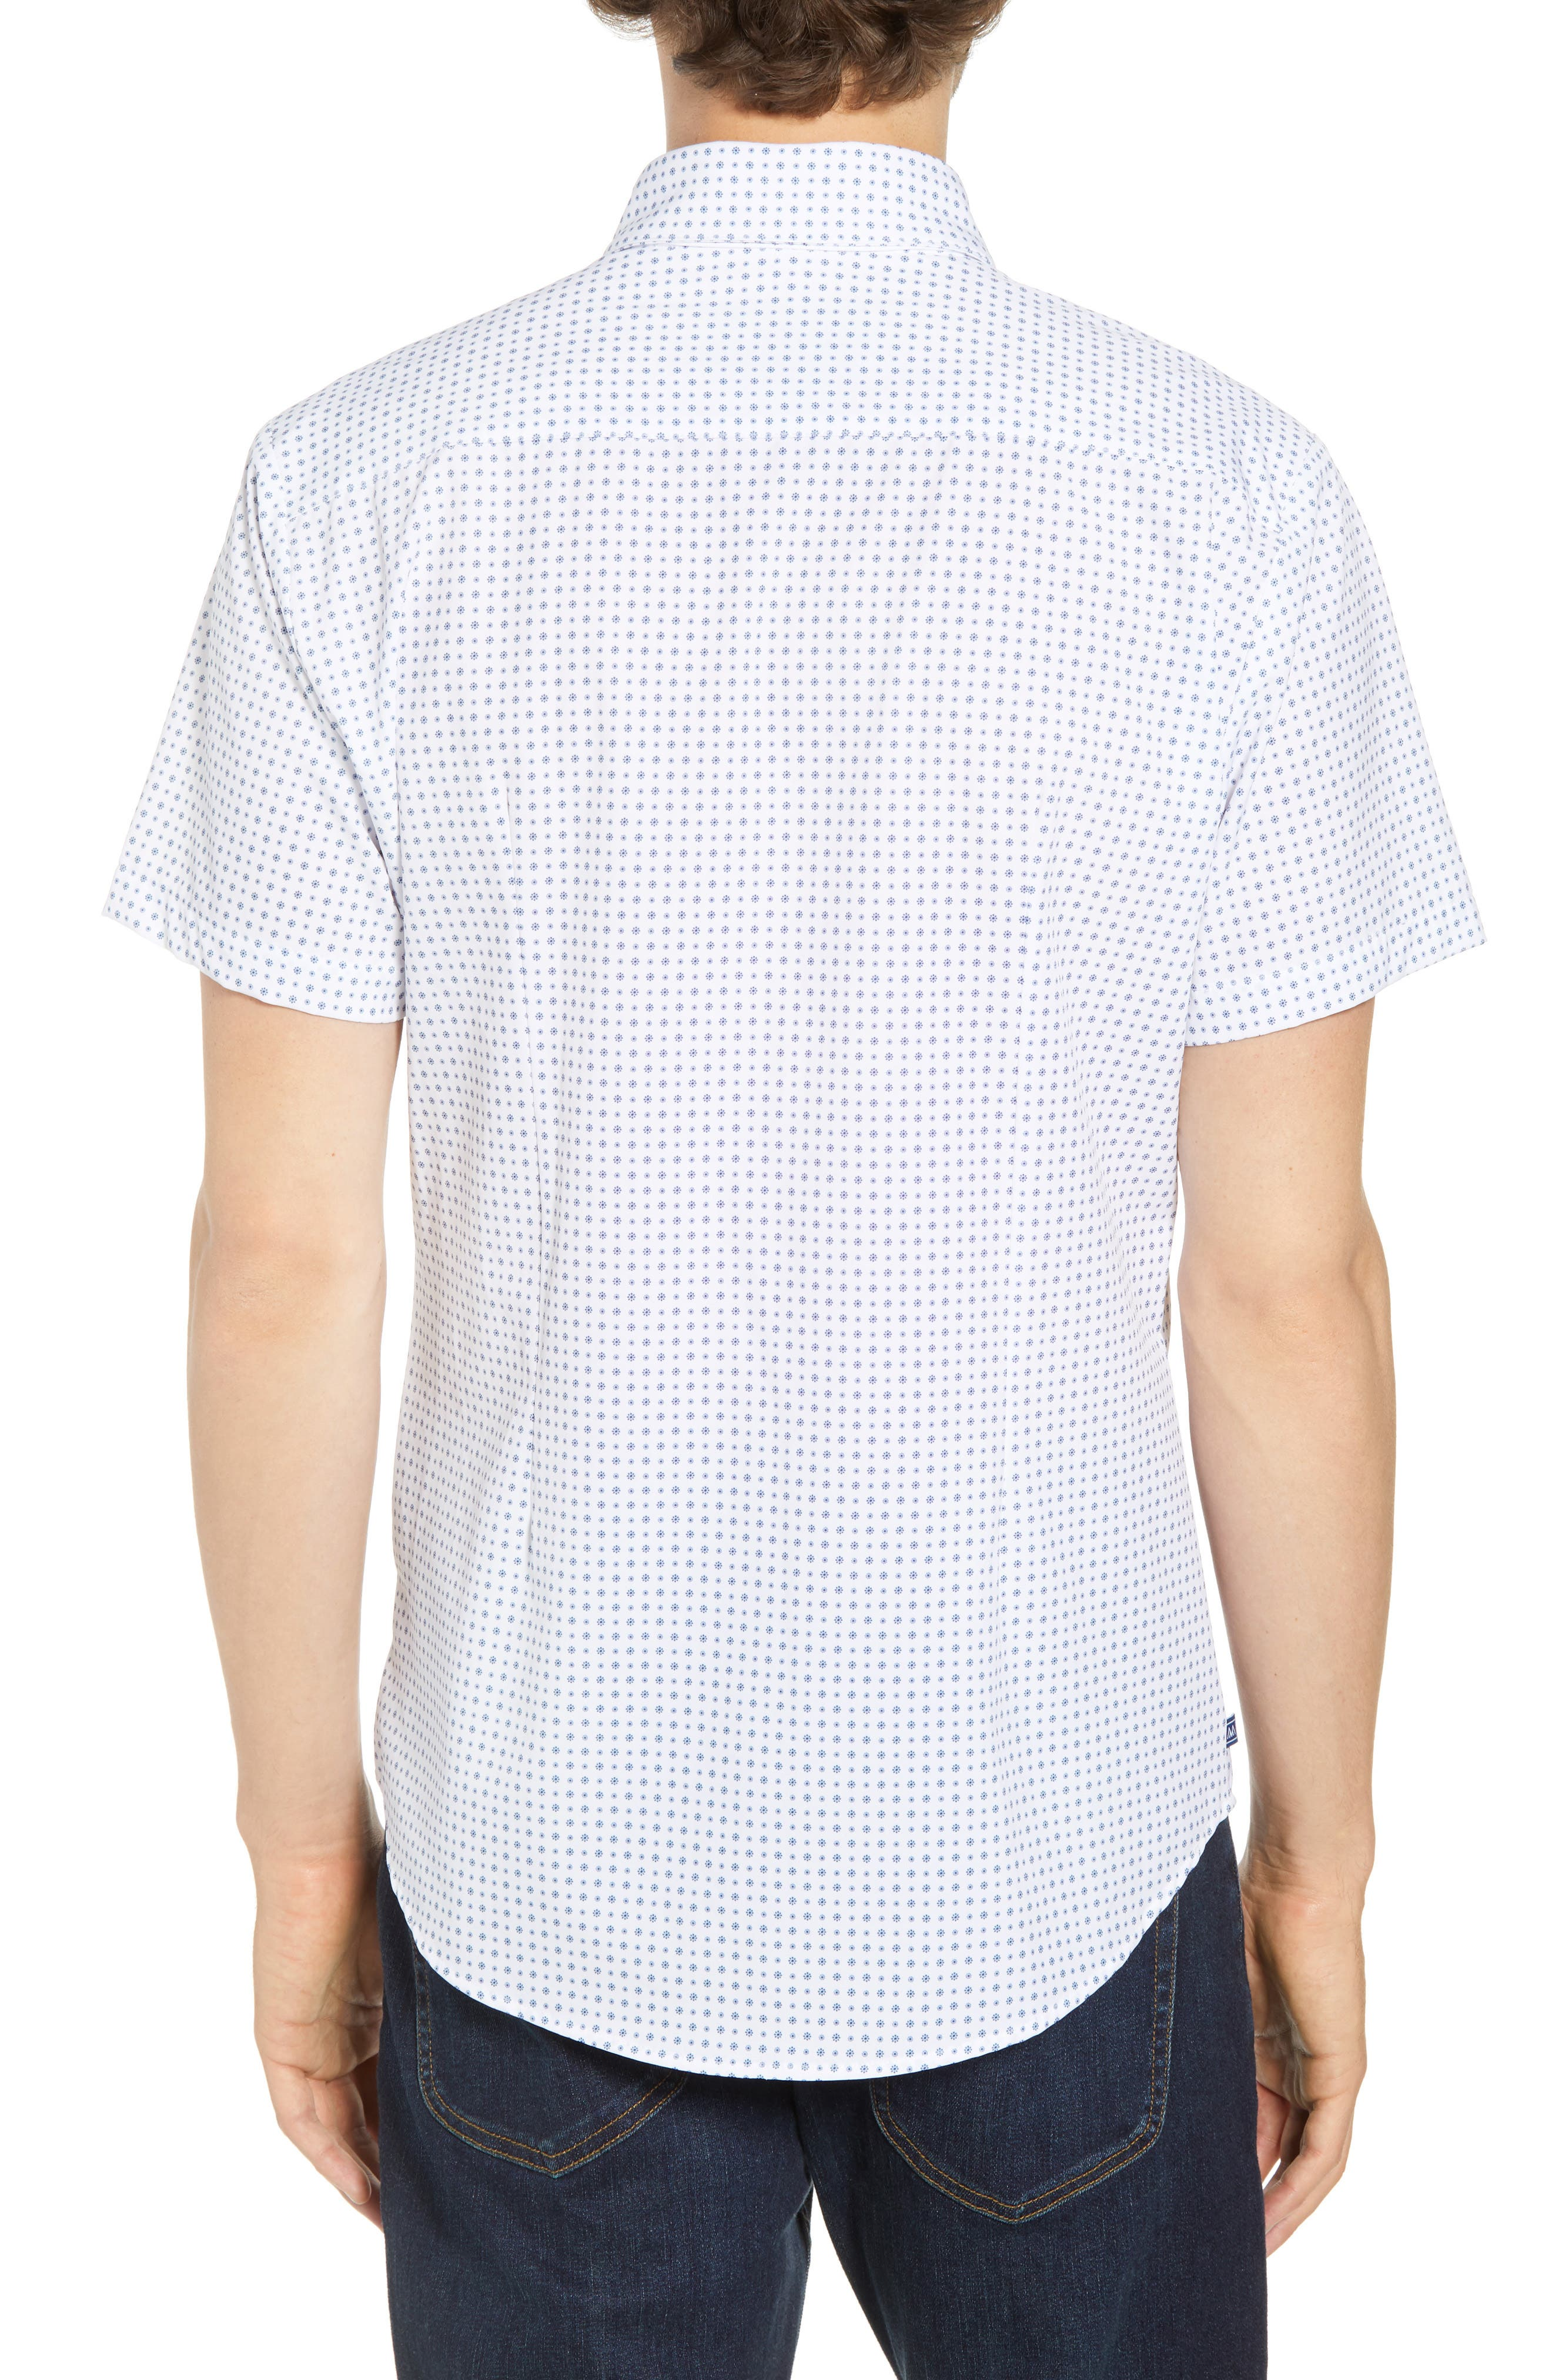 Darst Slim Fit Performance Sport Shirt,                             Alternate thumbnail 5, color,                             White